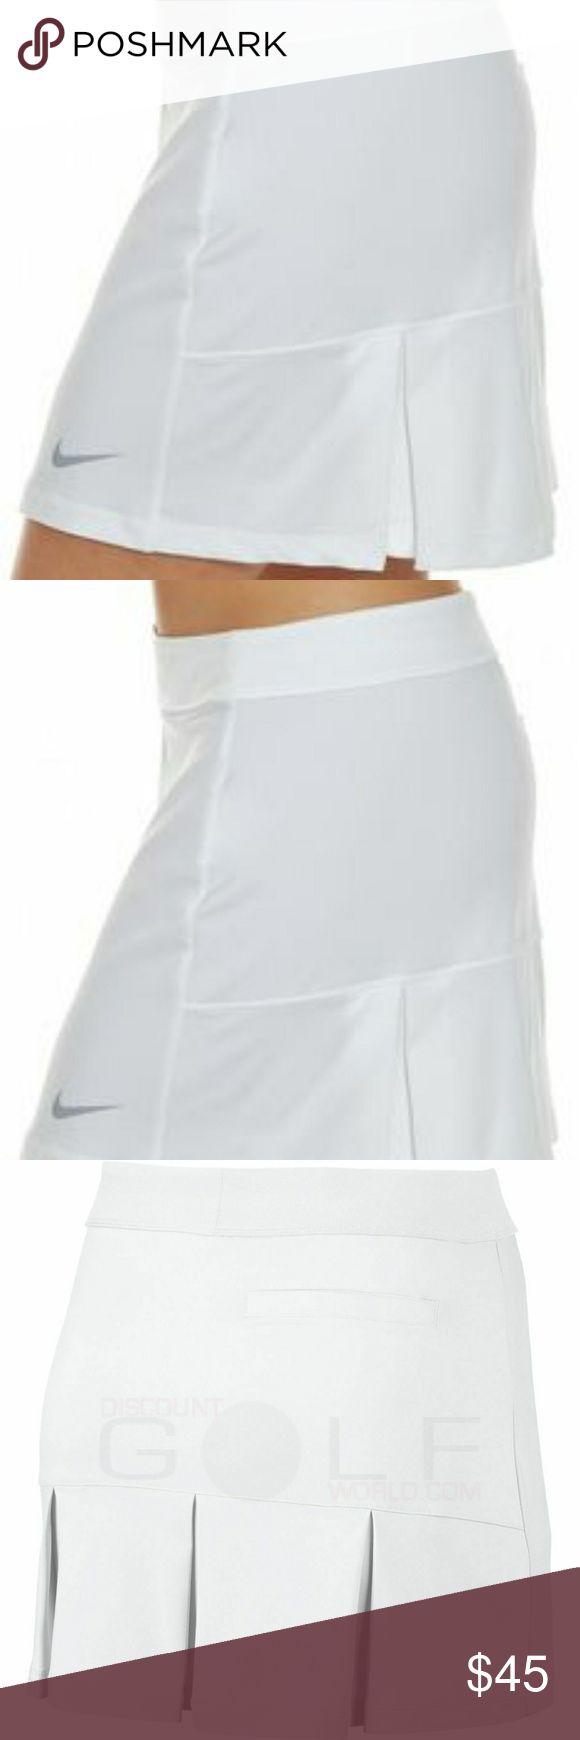 25 best ideas about golf skirts on tennis